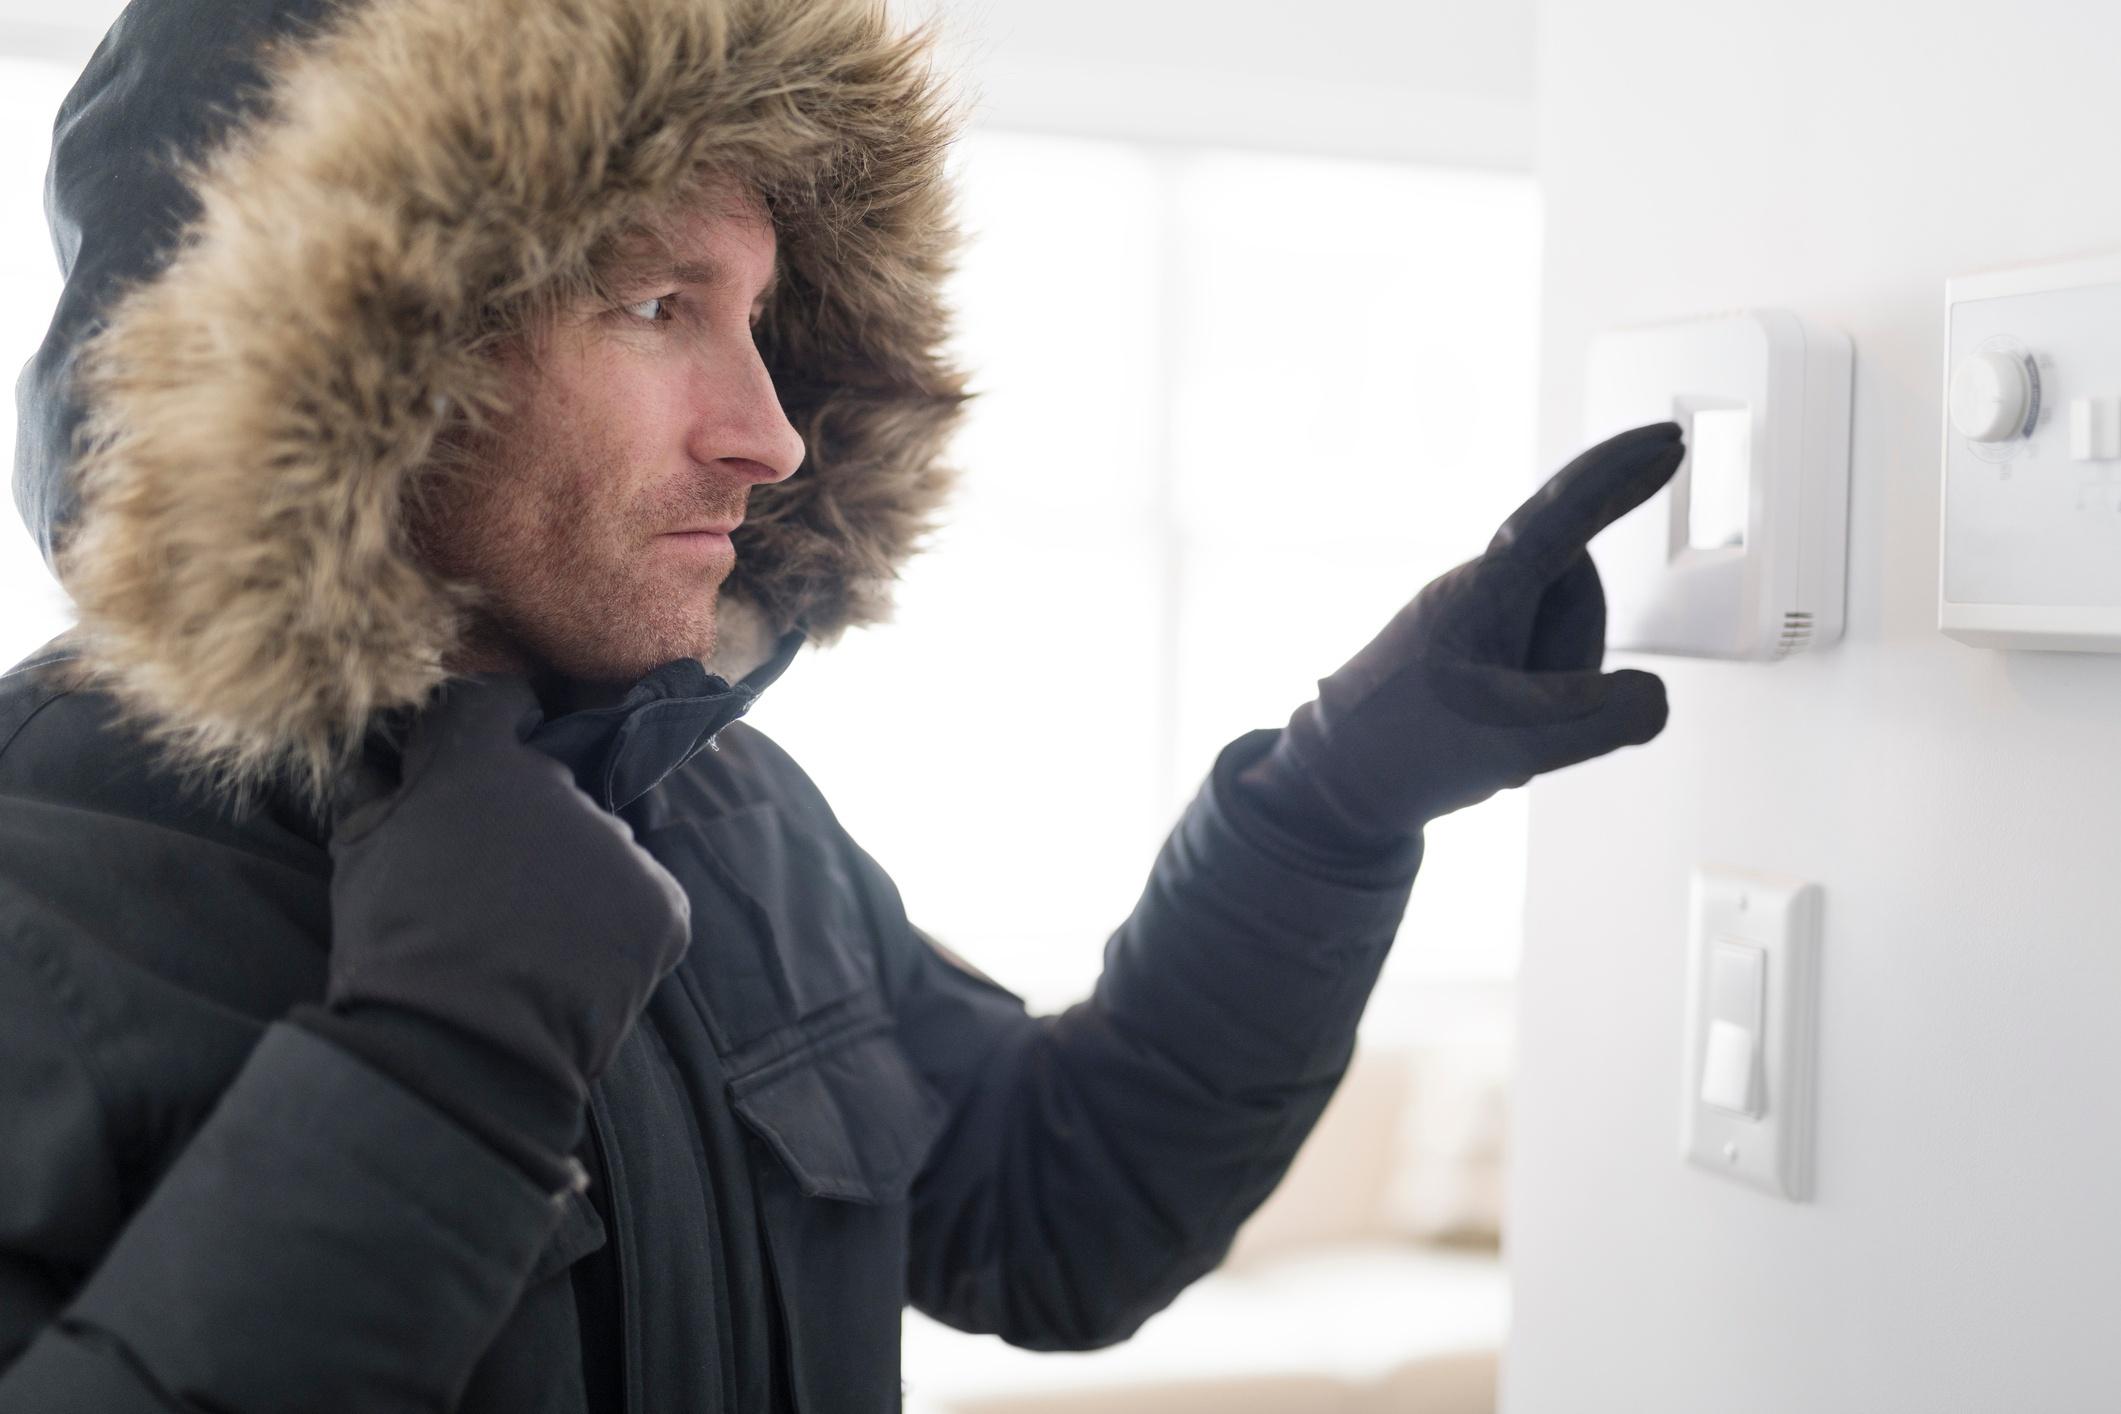 man in parka adjusting thermostat inside his home